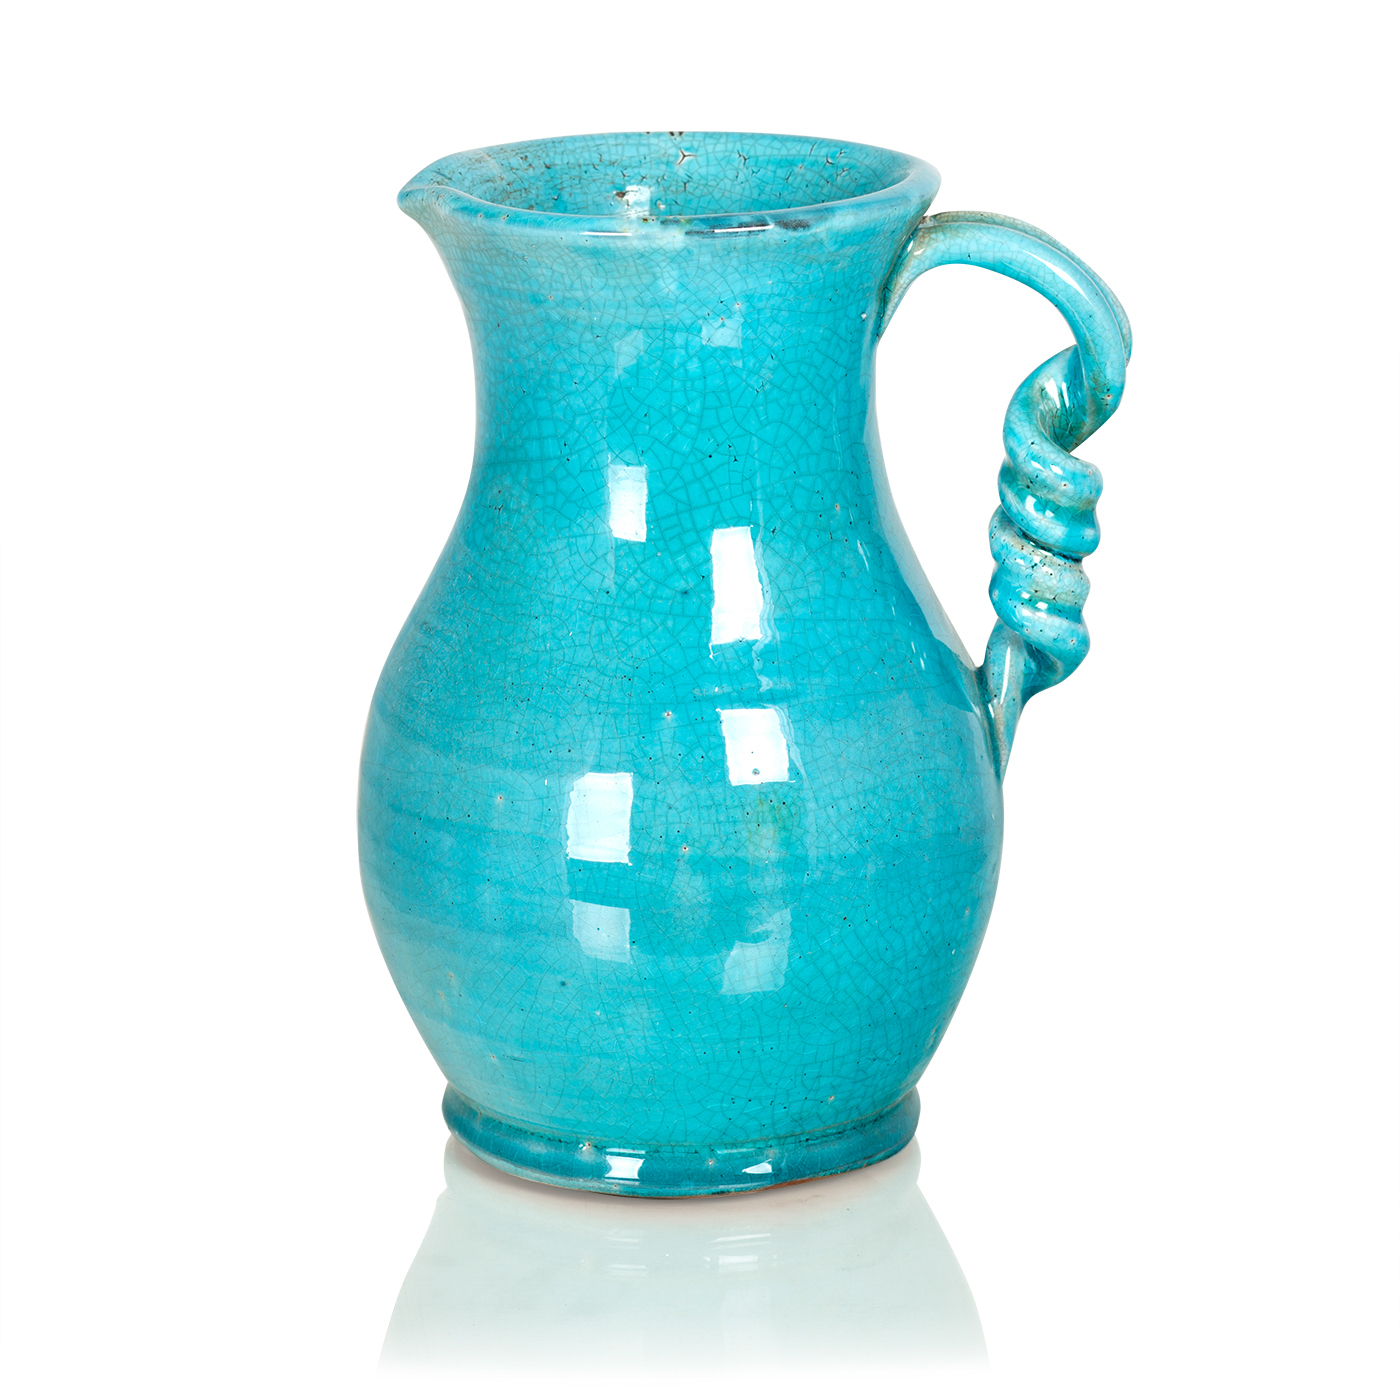 {} Home Philosophy Ваза-кувшин Chesnee Цвет: Голубой (21х28 см) home philosophy ваза mariana цвет молочный набор